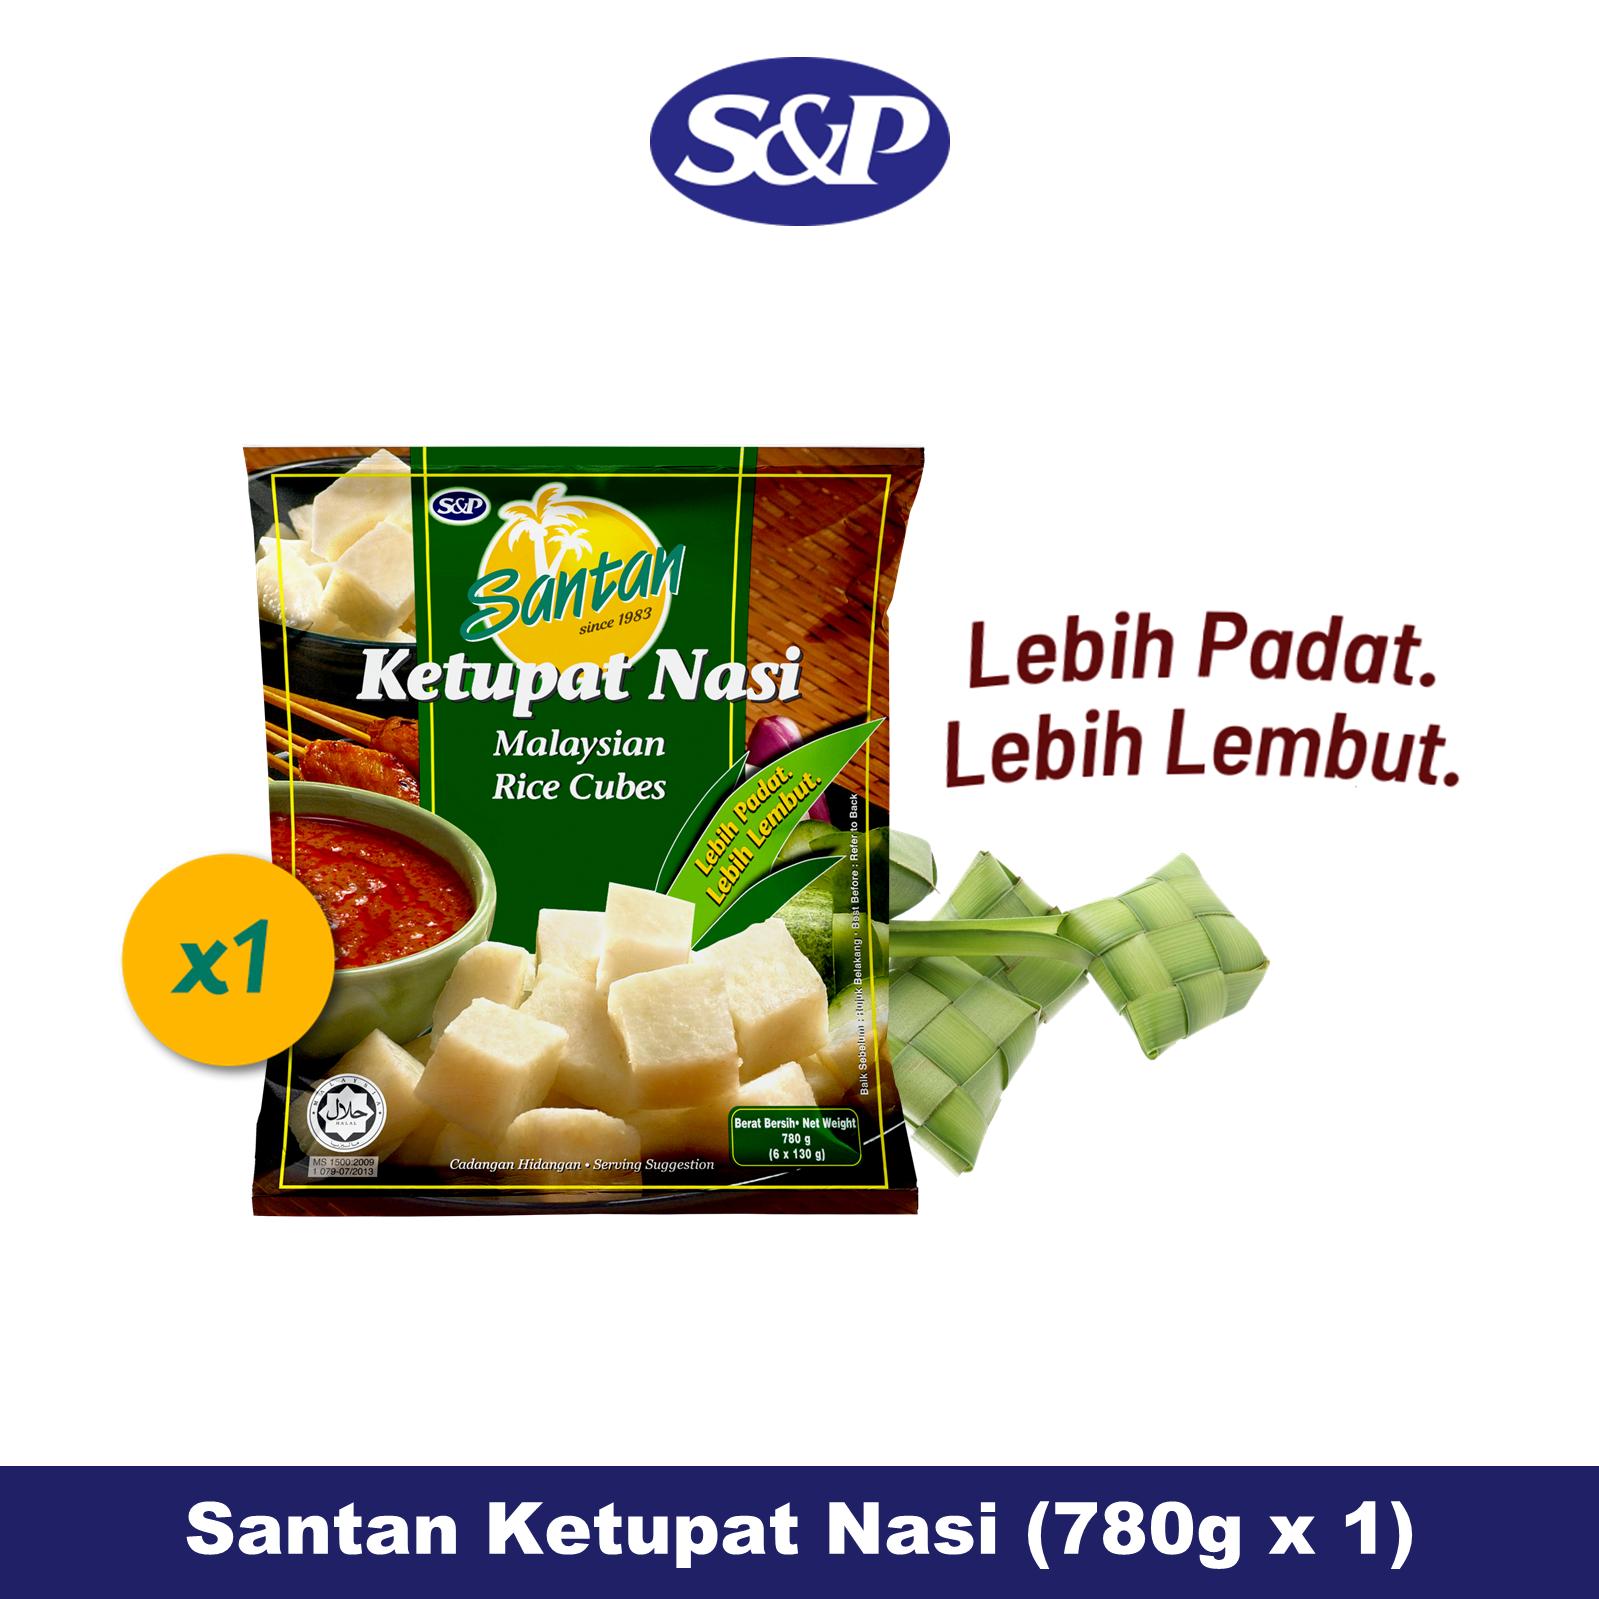 S&P Santan Rice Dumpling Ketupat Nasi (780g)